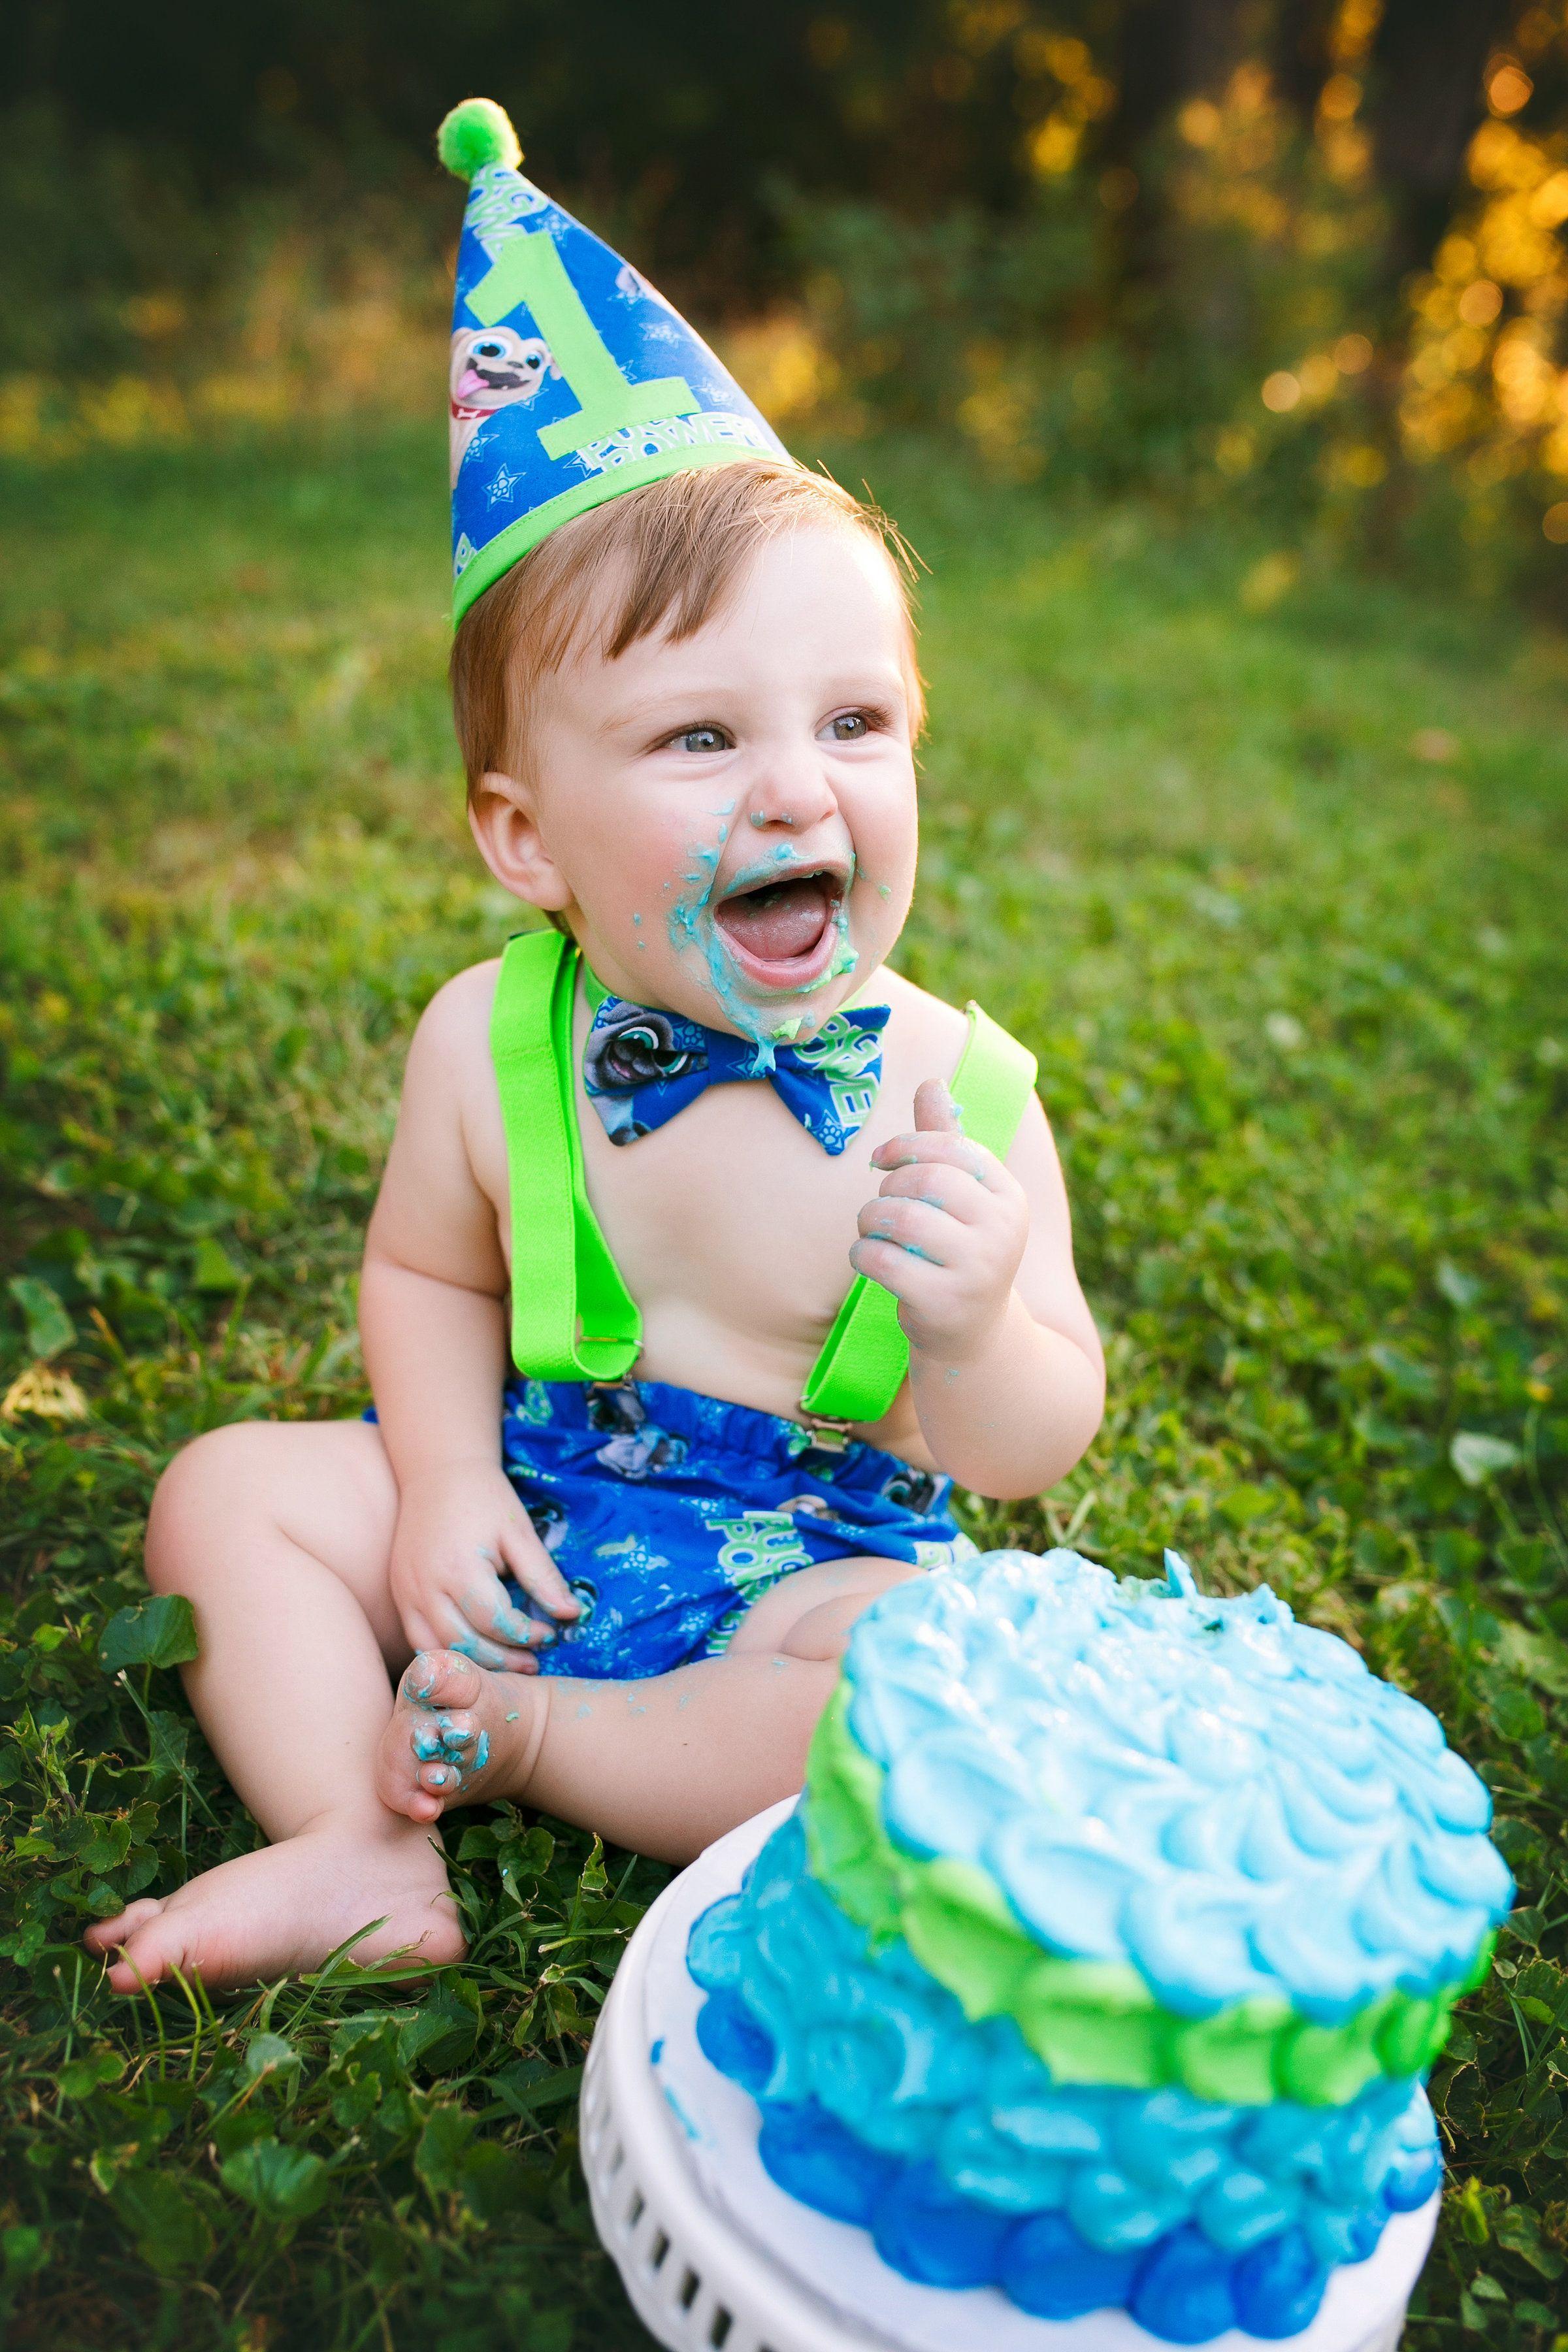 Puppy Dog Pals Outdoor Smash Cake First Birthday Outdoor Baby